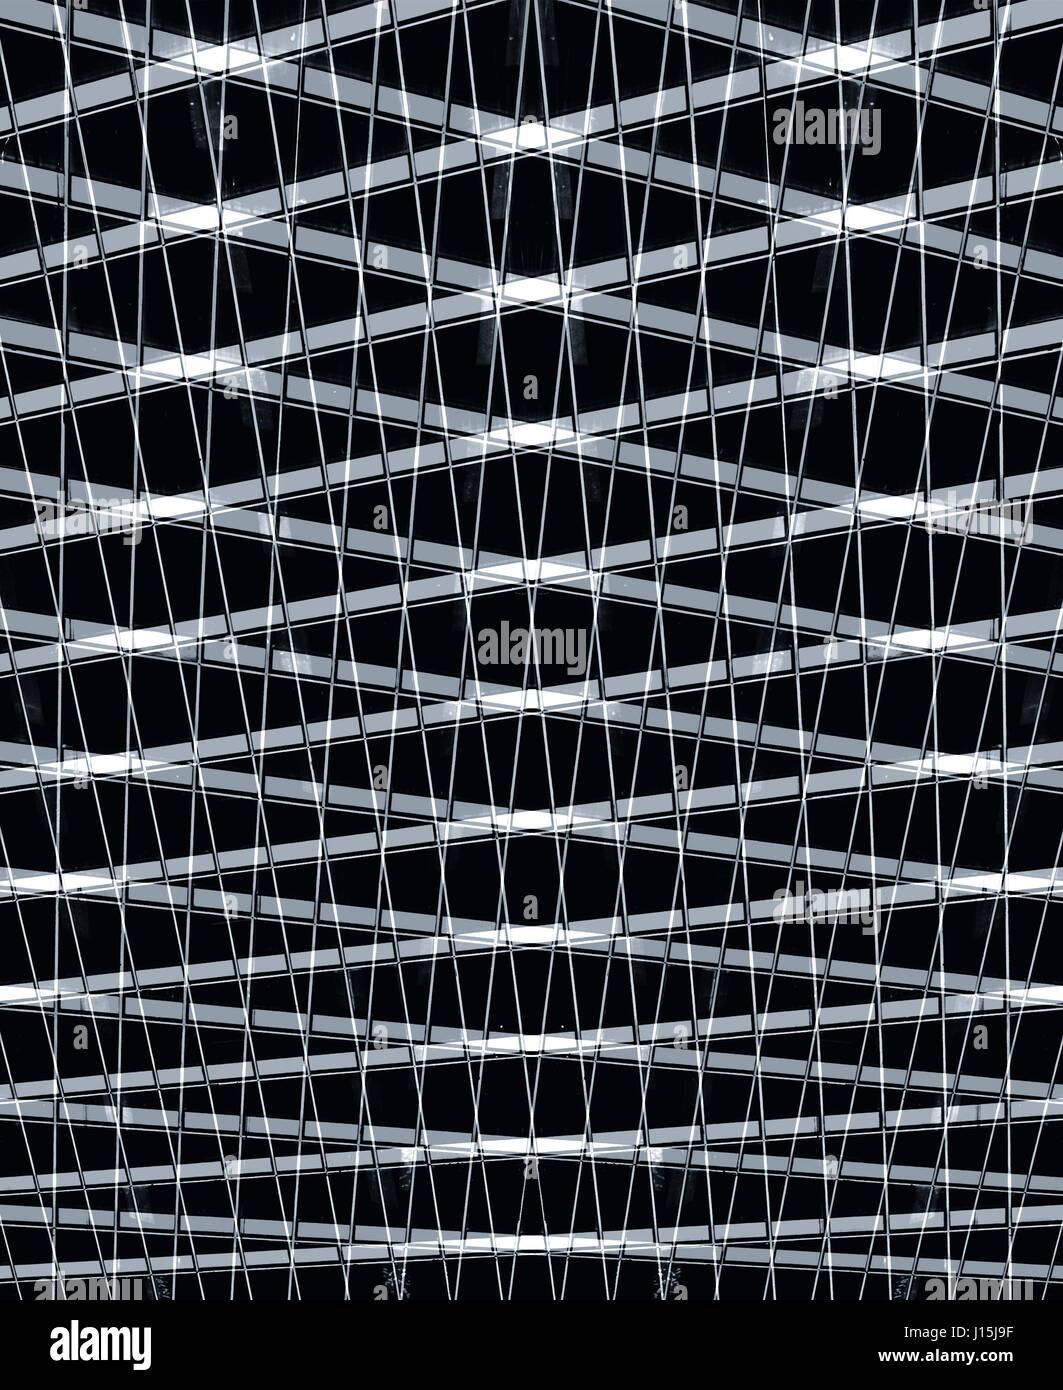 industrial pattern in black - Stock Image